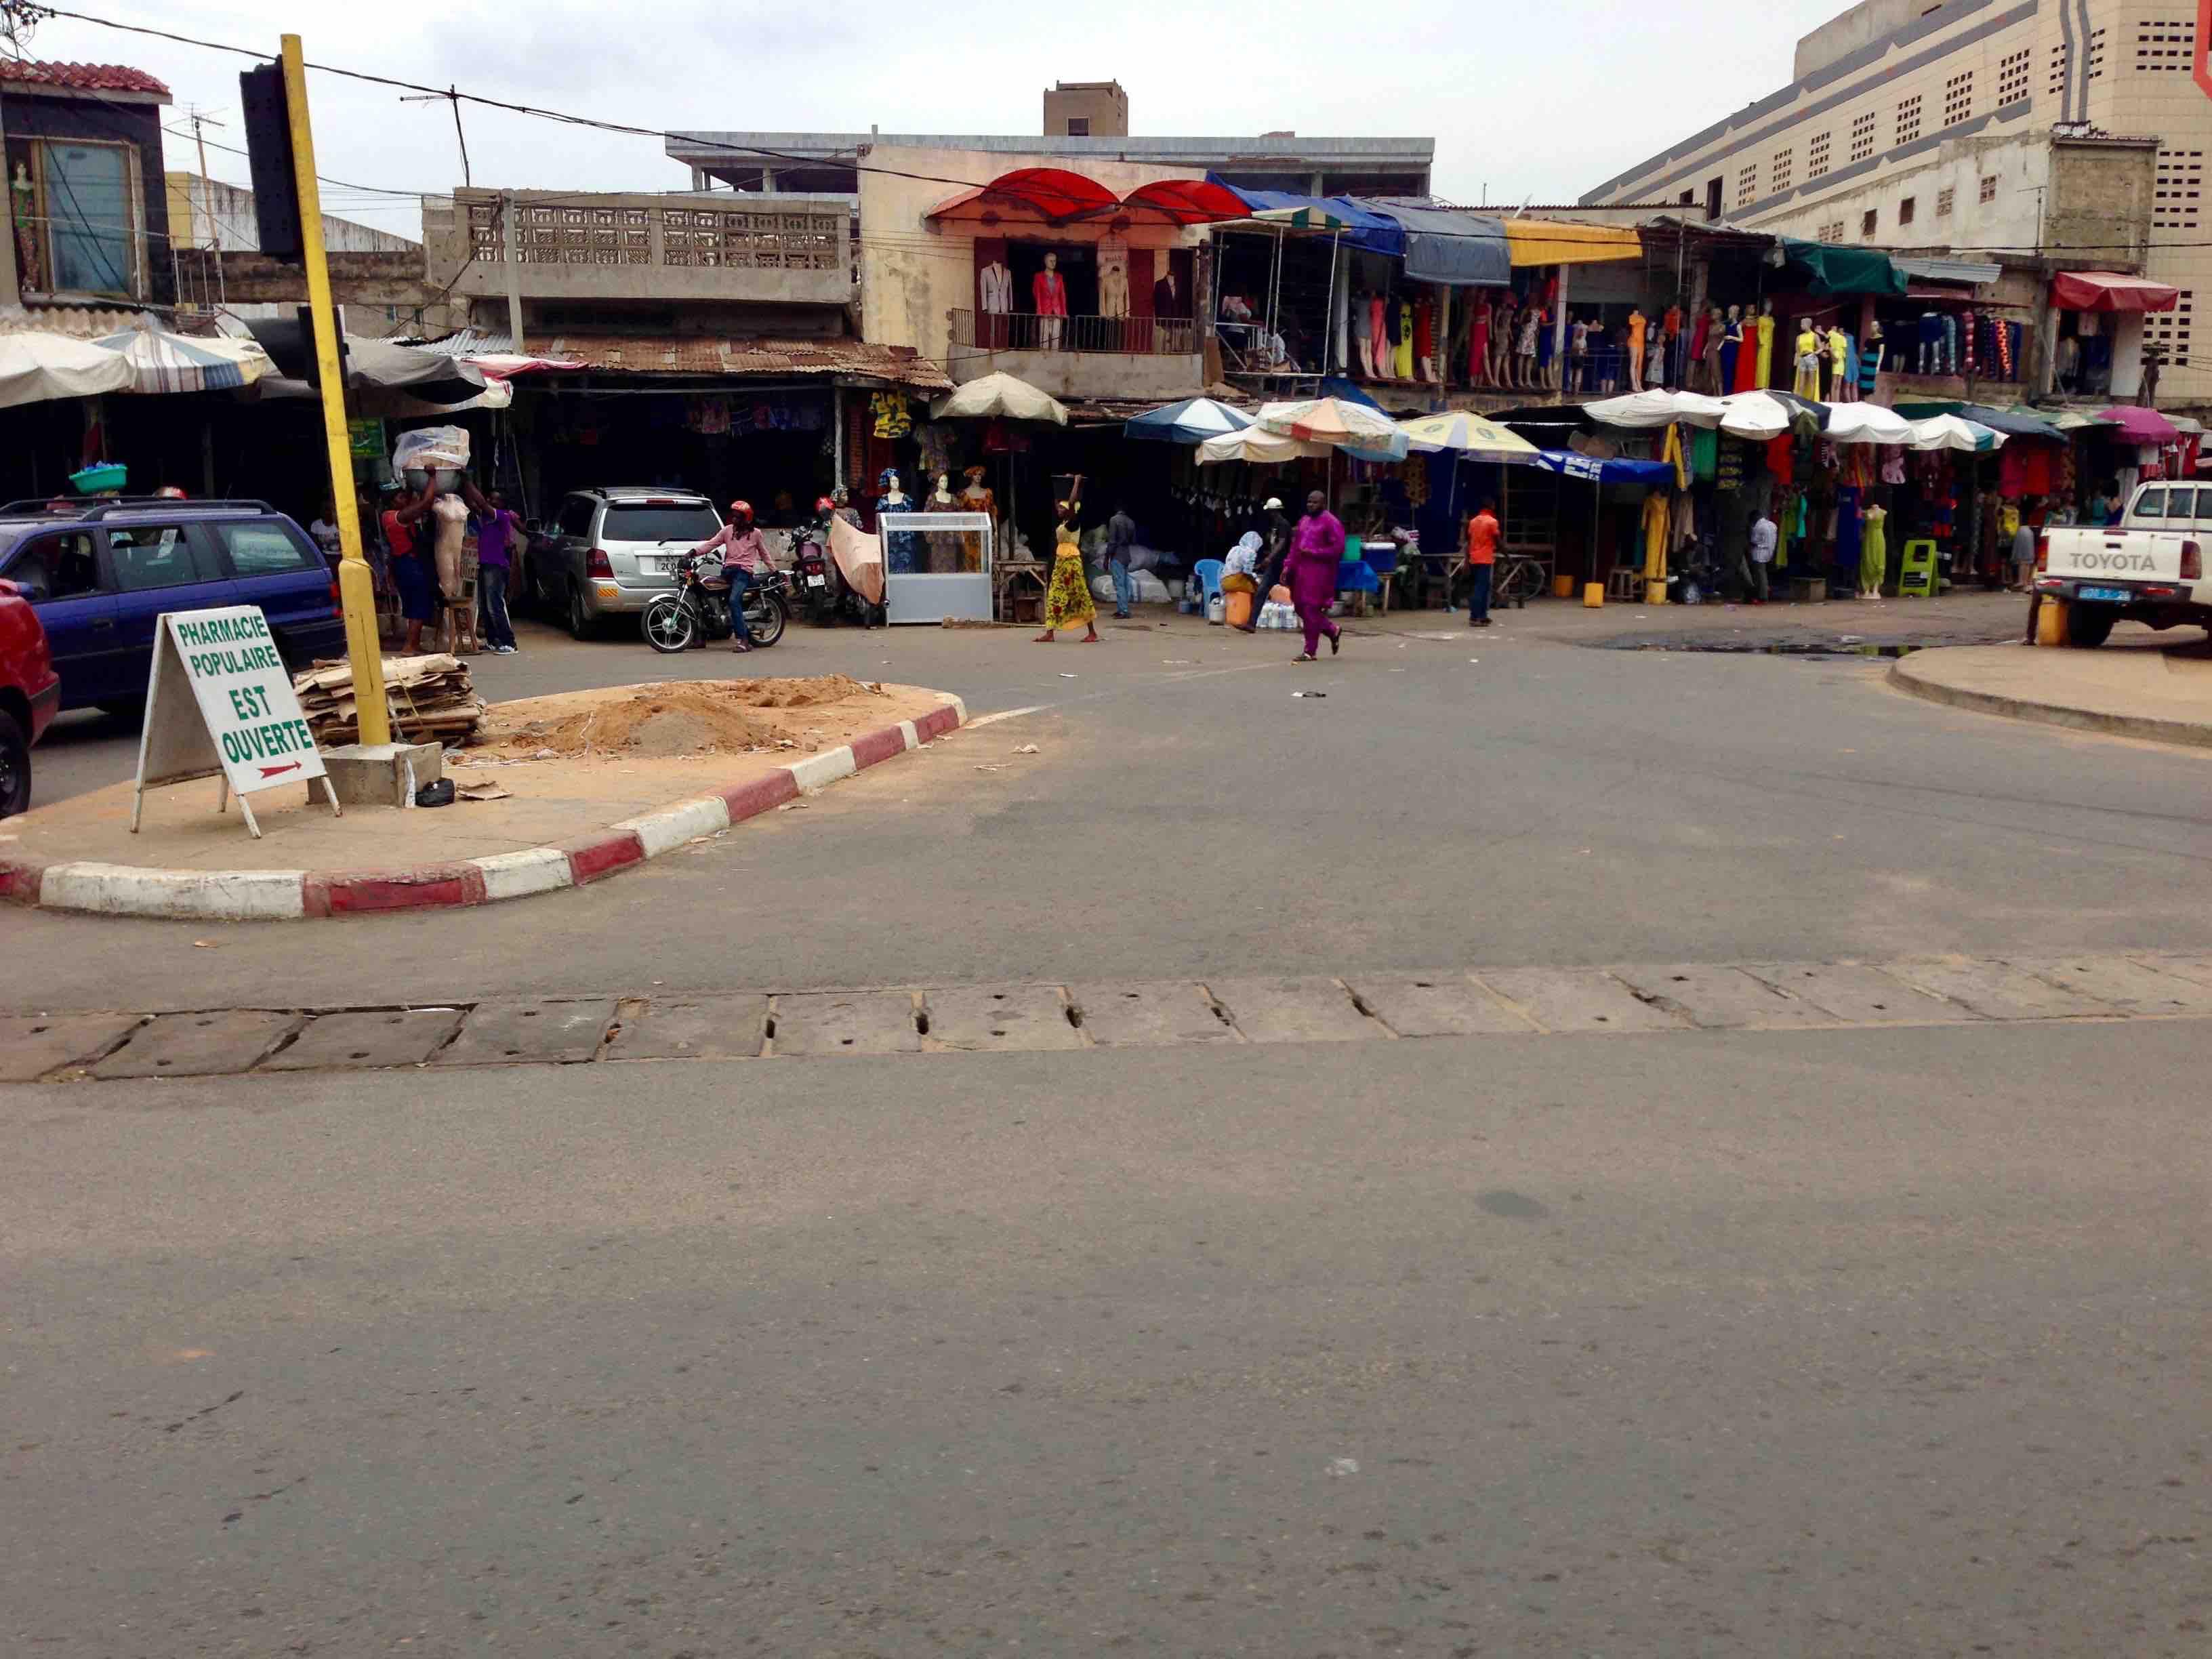 Street scene in Lome, Maritime Region, Togo. #JujuFilms